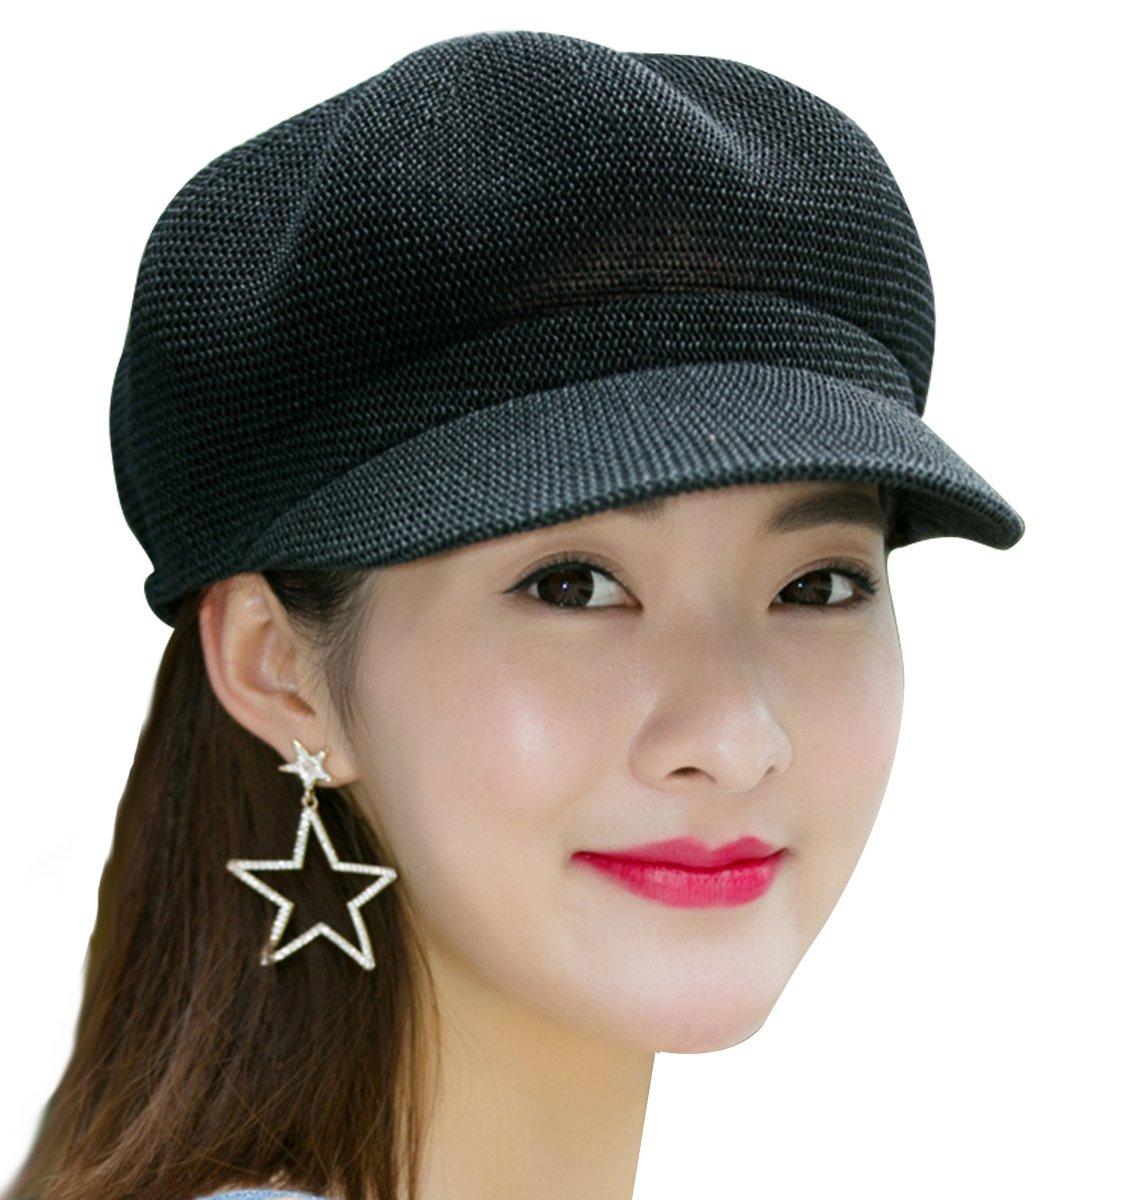 Clecibor Women Summer Straw Newsboy Cap Beret Breathable Mesh Octagonal Cap, Black